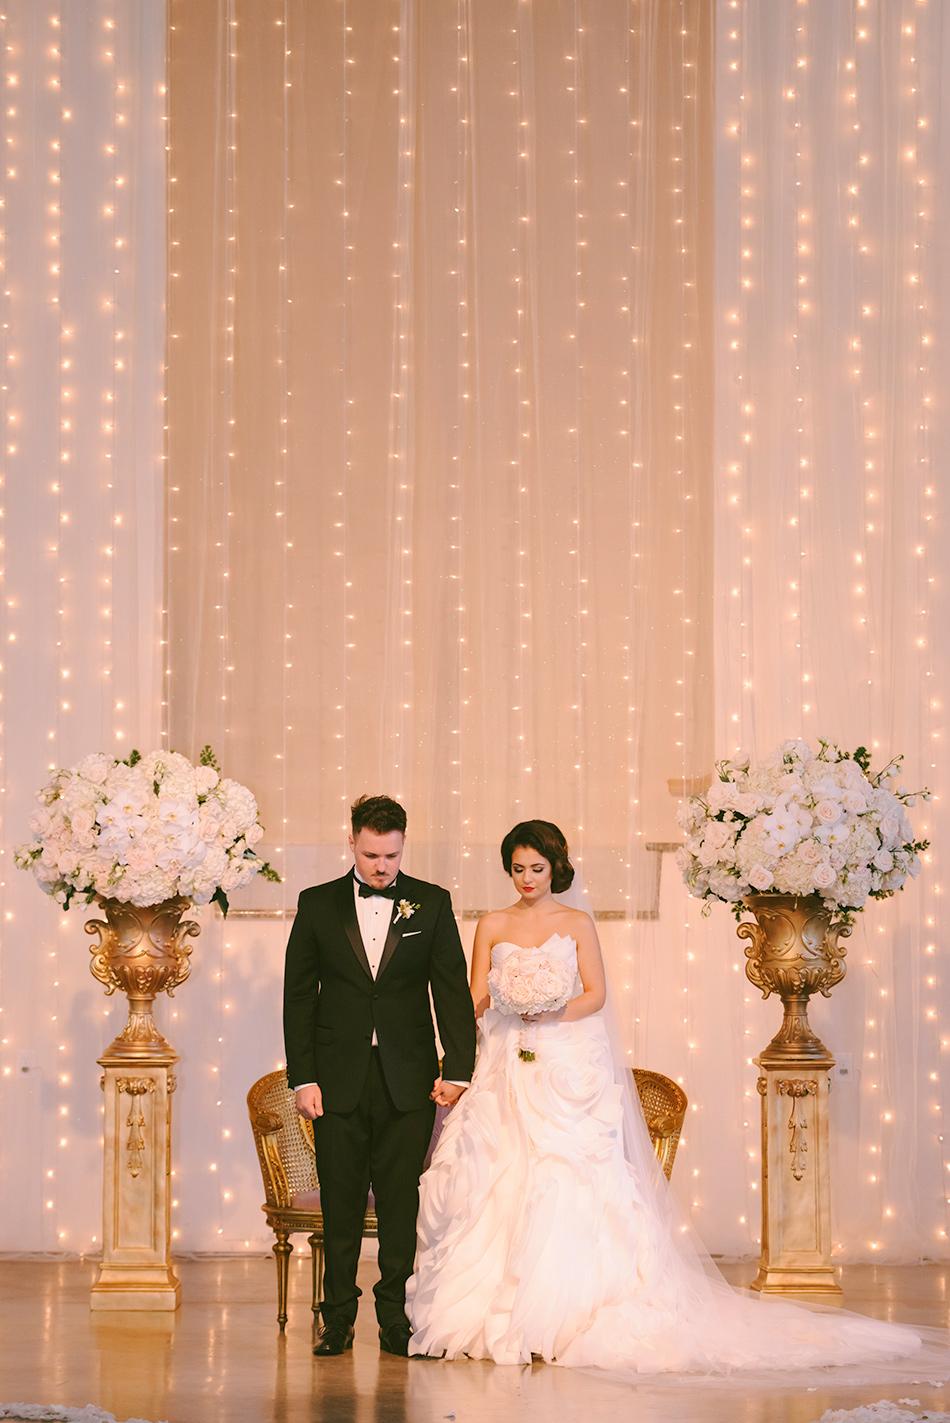 AD Passion Photography | stephany-and-nathan-wedding-dallas_136 | Adelin, Dida, fotograf profesionist, fotograf de nunta, fotografie de nunta, fotograf Timisoara, fotograf Craiova, fotograf Bucuresti, fotograf Arad, nunta Timisoara, nunta Arad, nunta Bucuresti, nunta Craiova